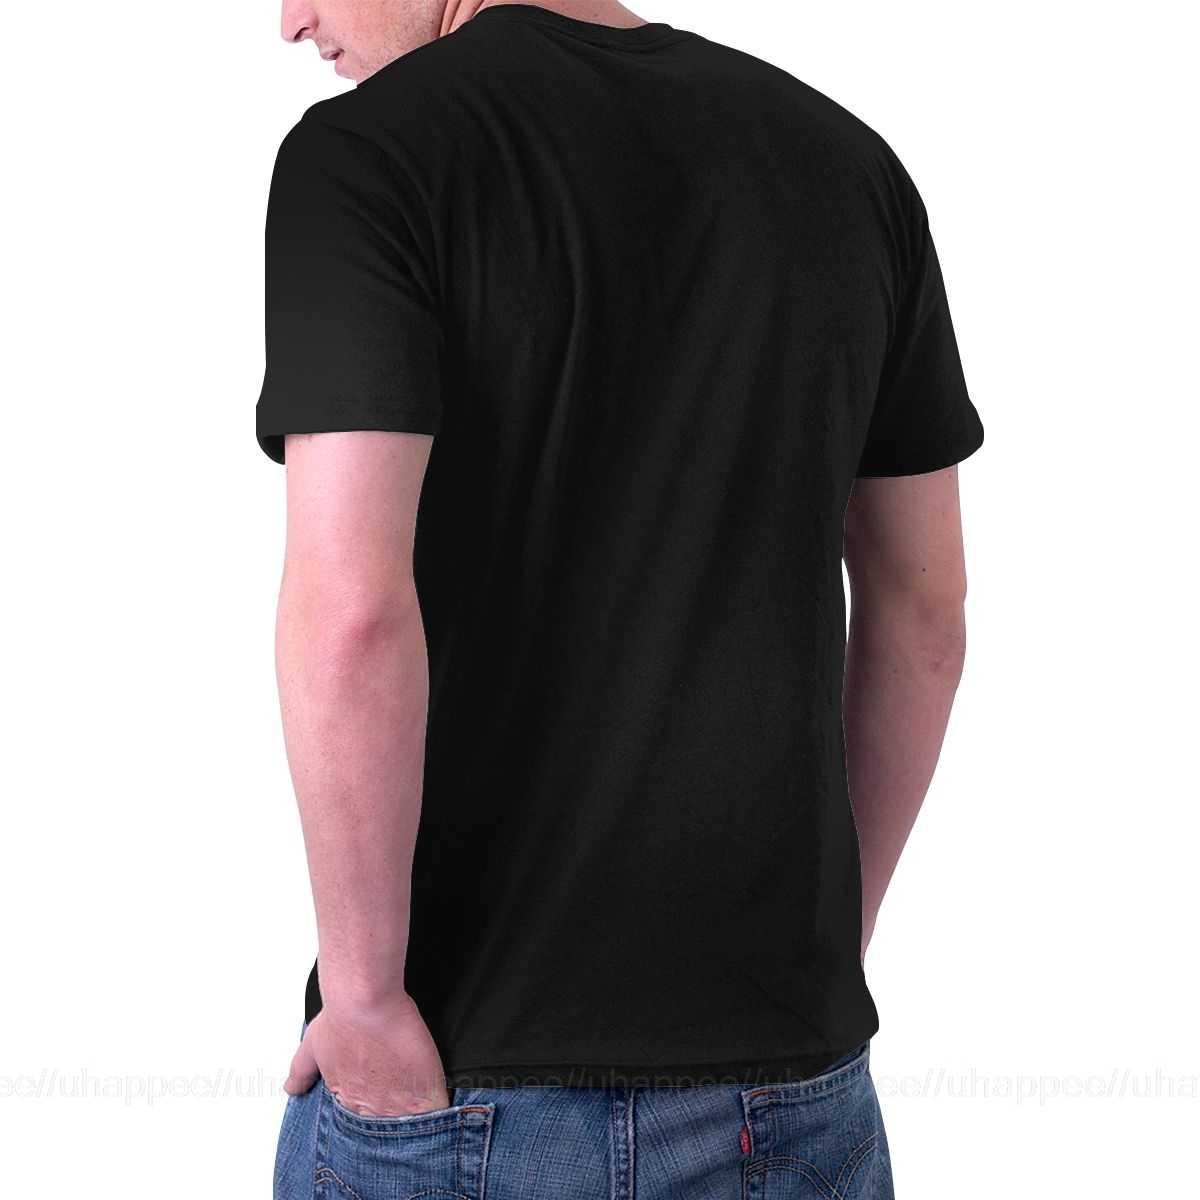 LIMITED NEW 2020 Craftsman Tools T-Shirt Racing shirt mechanics tee